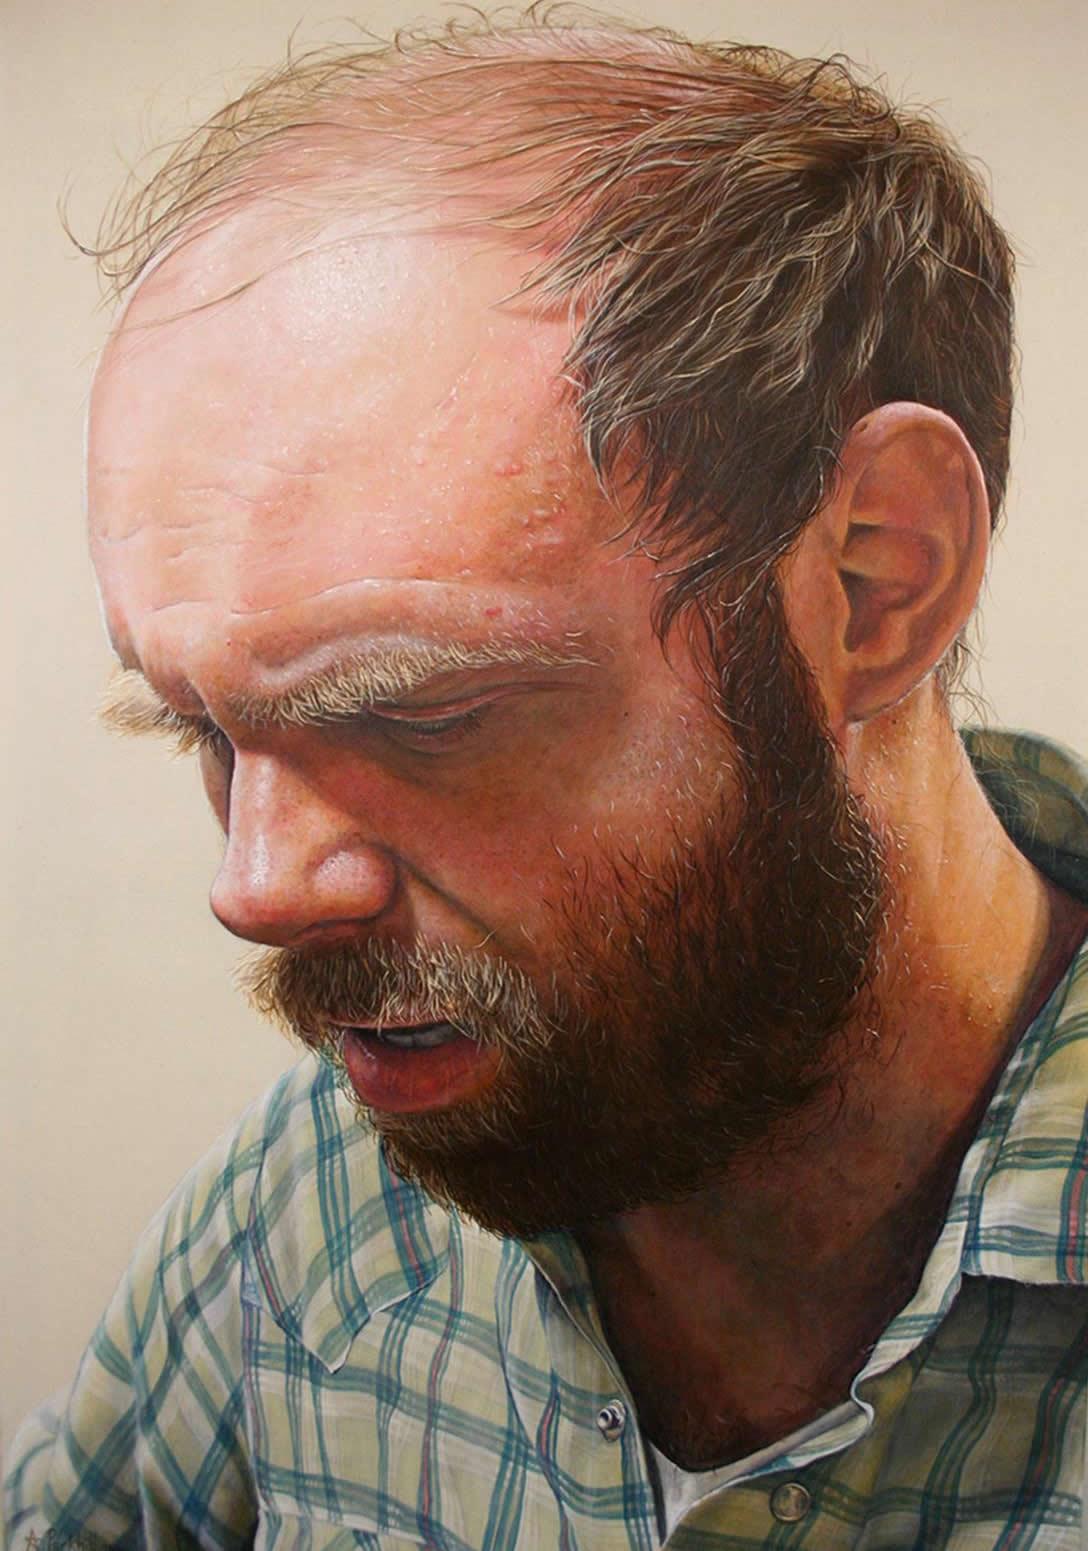 Austin Parkhill - Barrow, AK artist